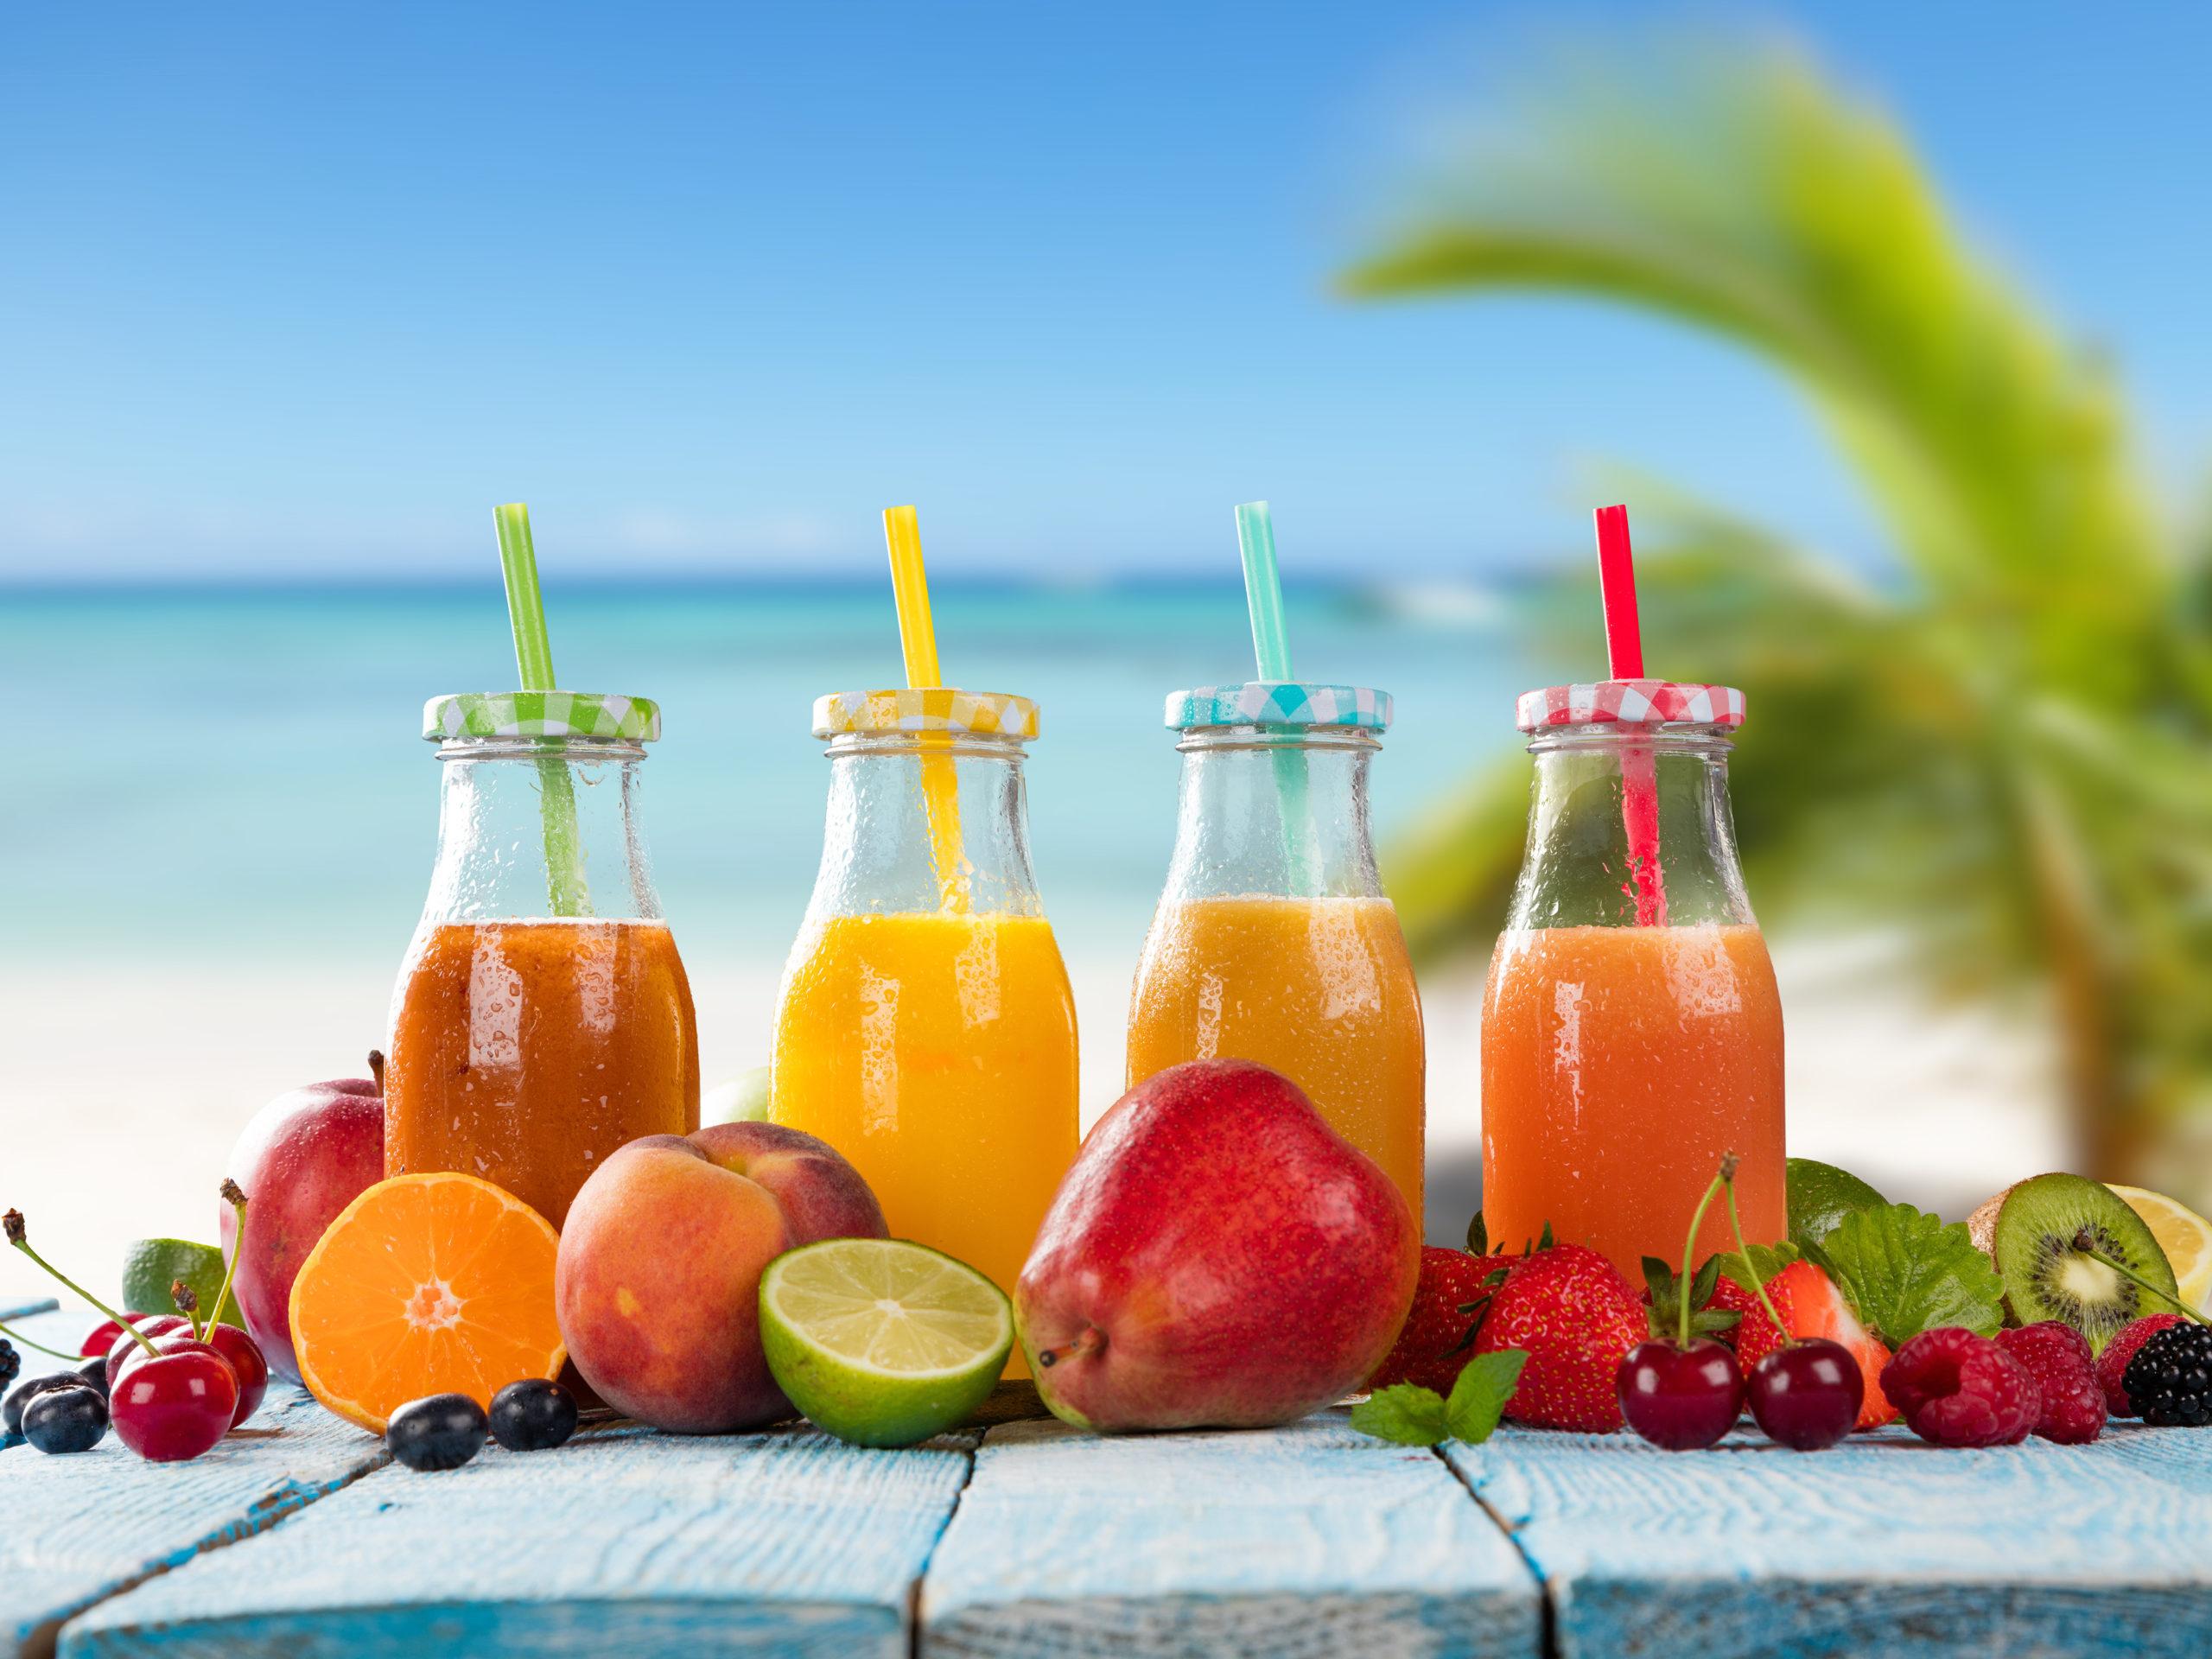 Juices orange